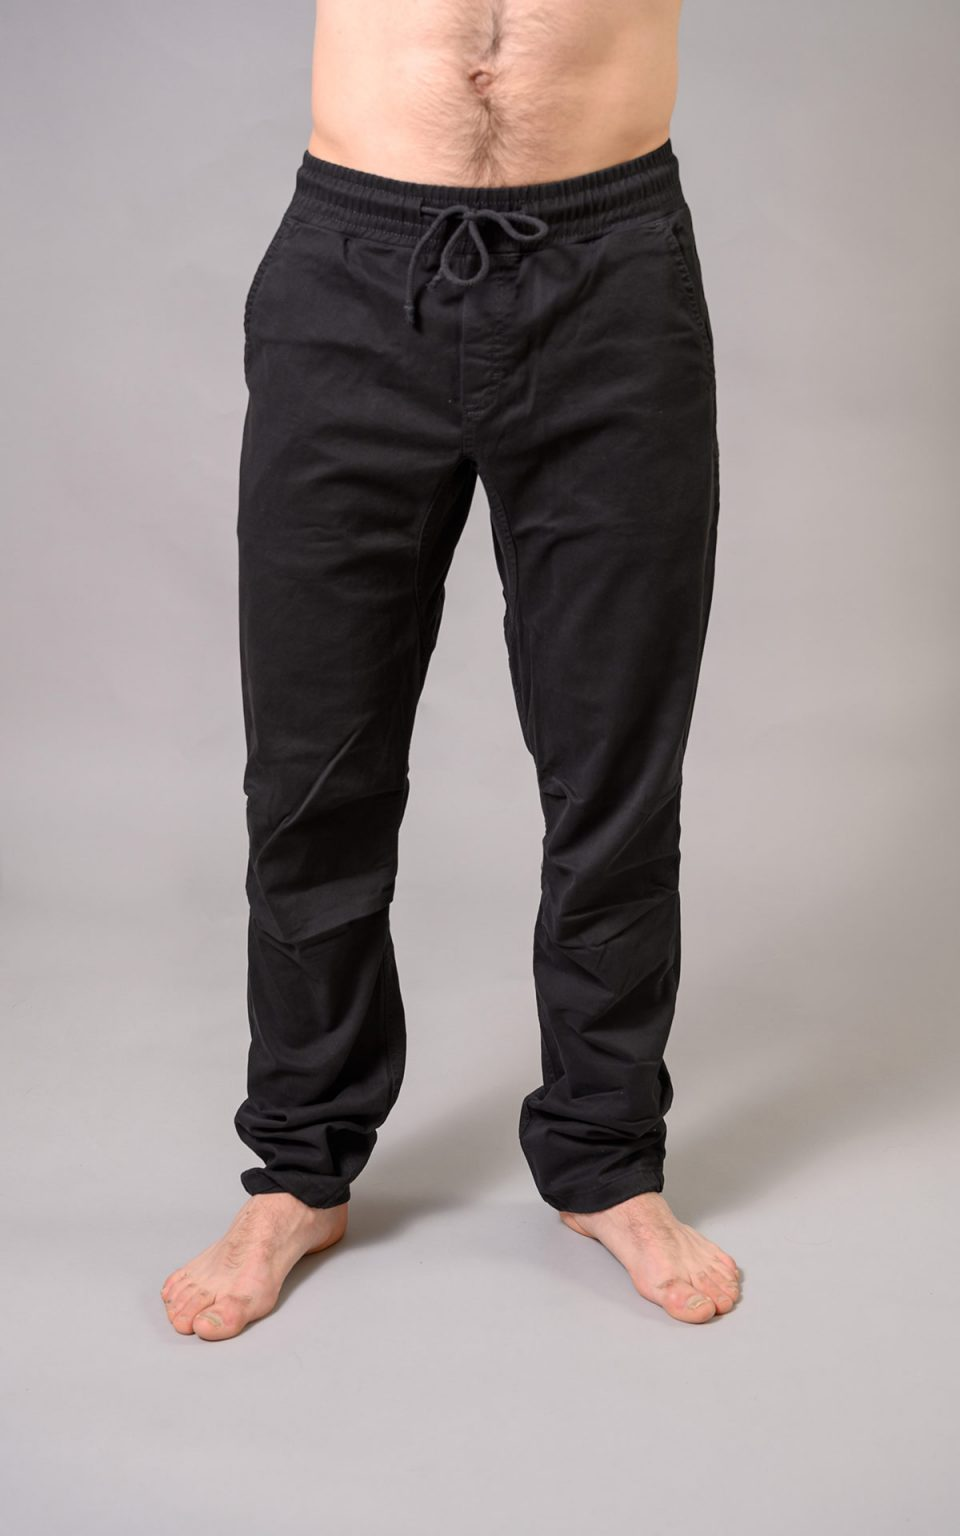 Spodnie Cotton Crosscut man- czarne